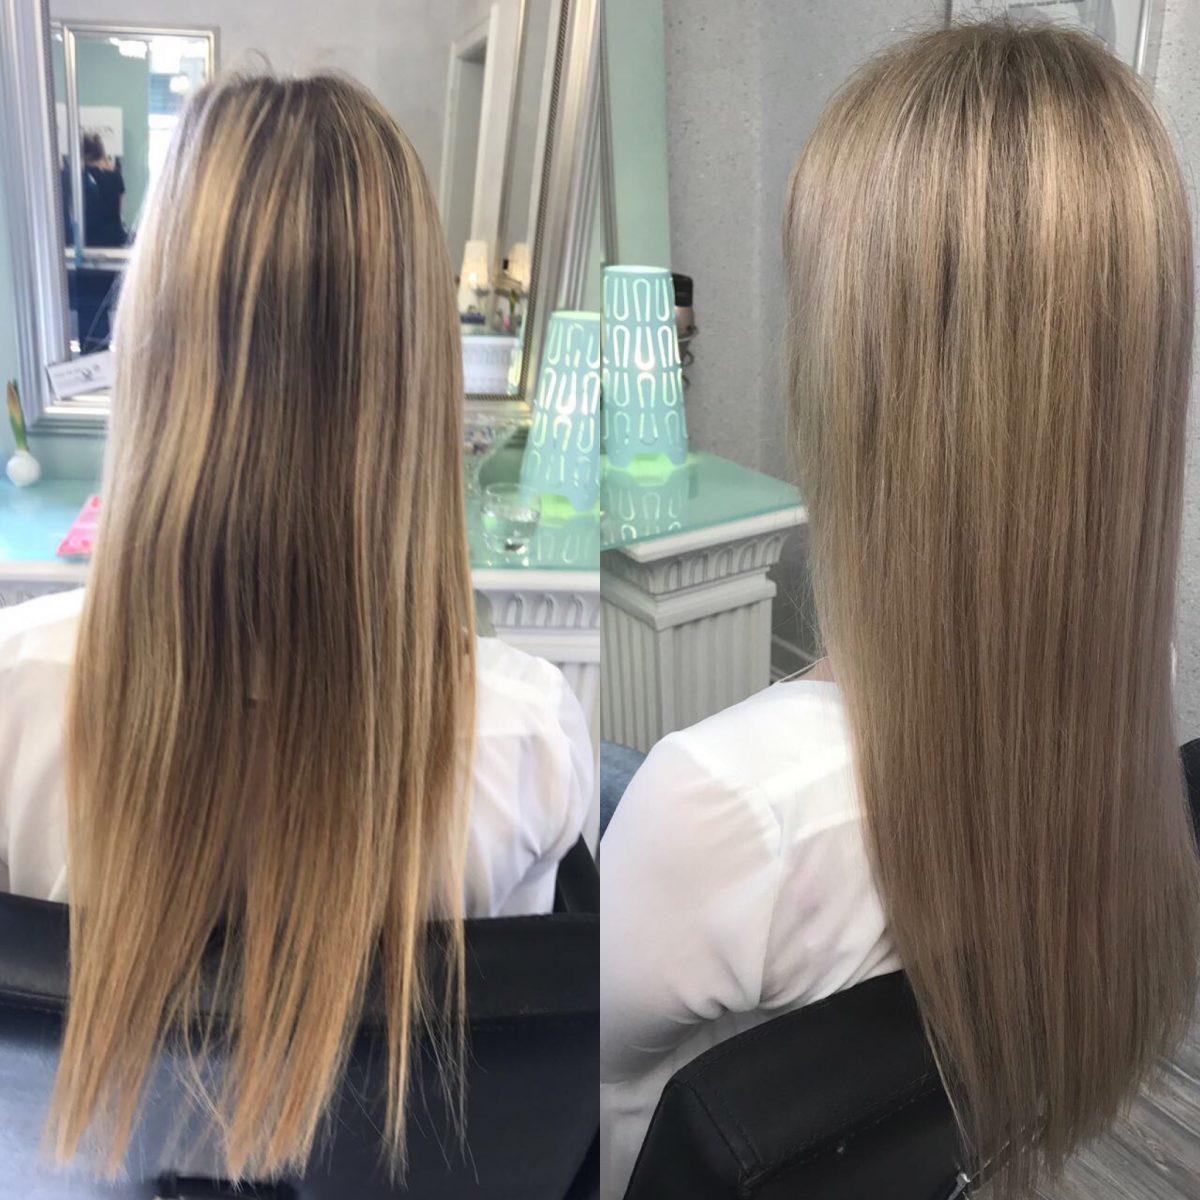 NEW HAIR: SOFT BALAYAGE BY AB-SCHNITTTREFF